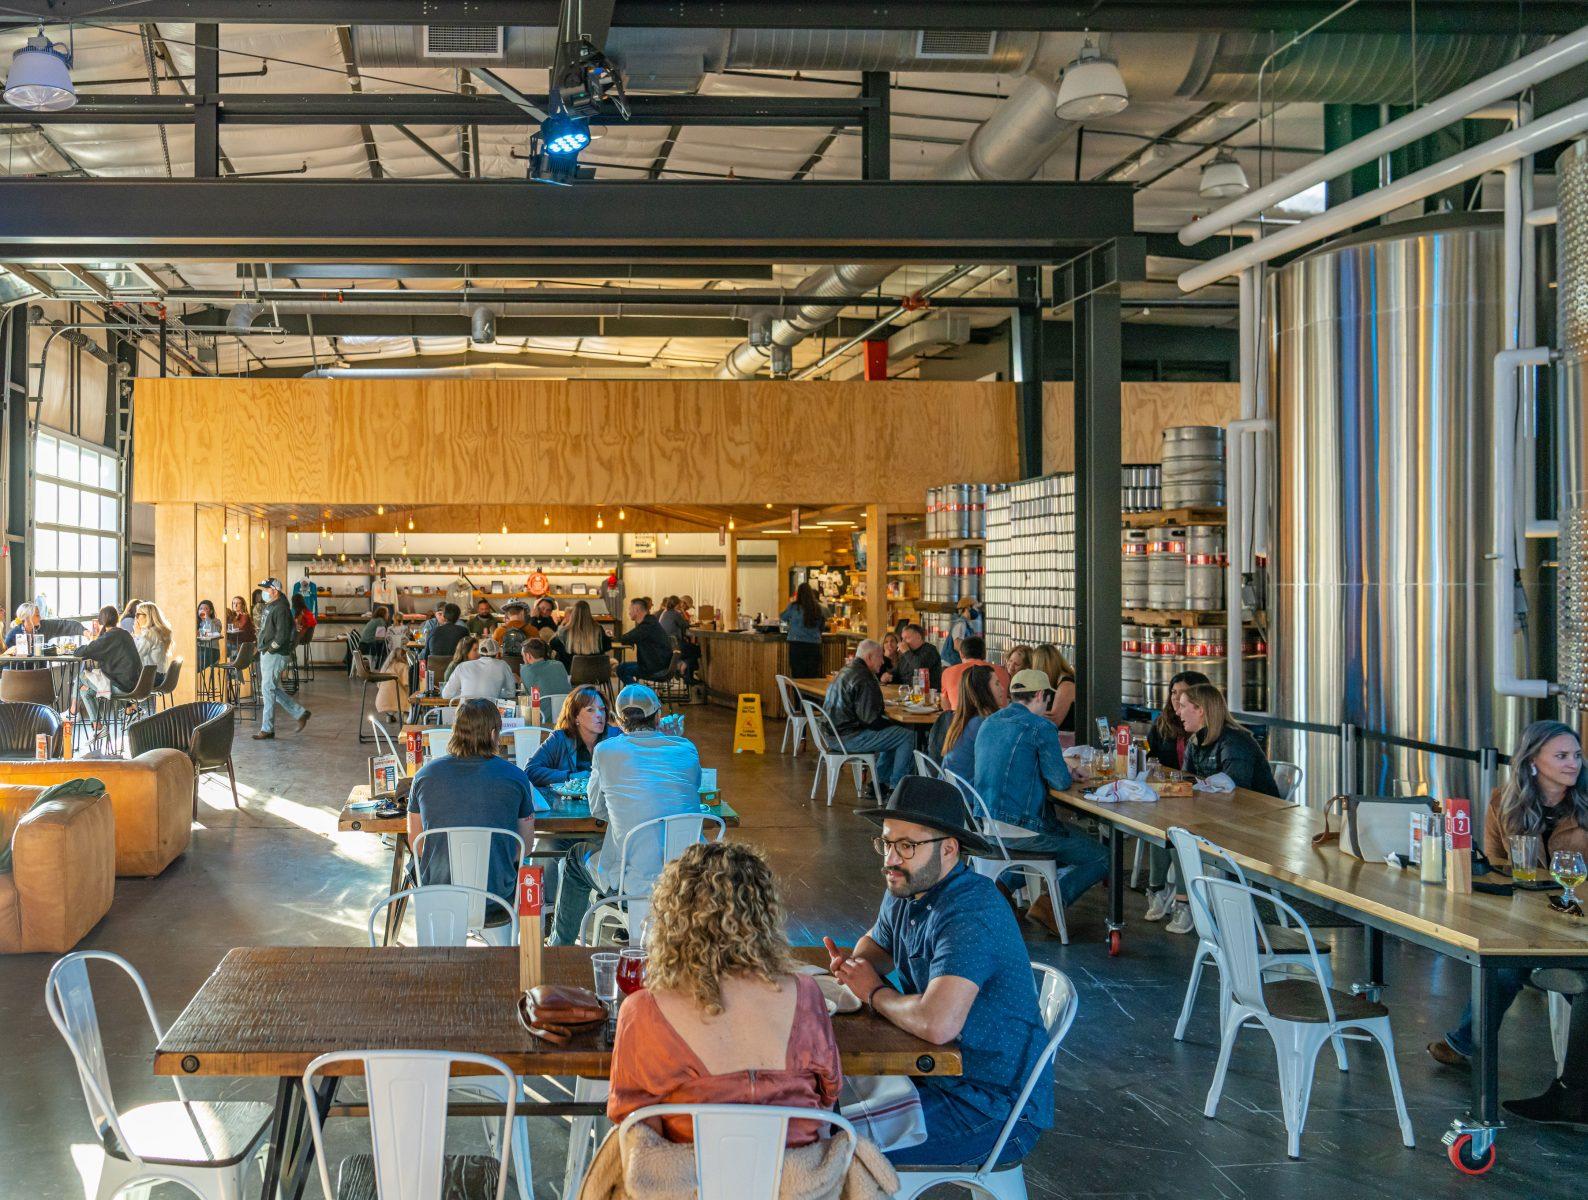 The Jackalope Brewery on Houston St in Nashville, TN